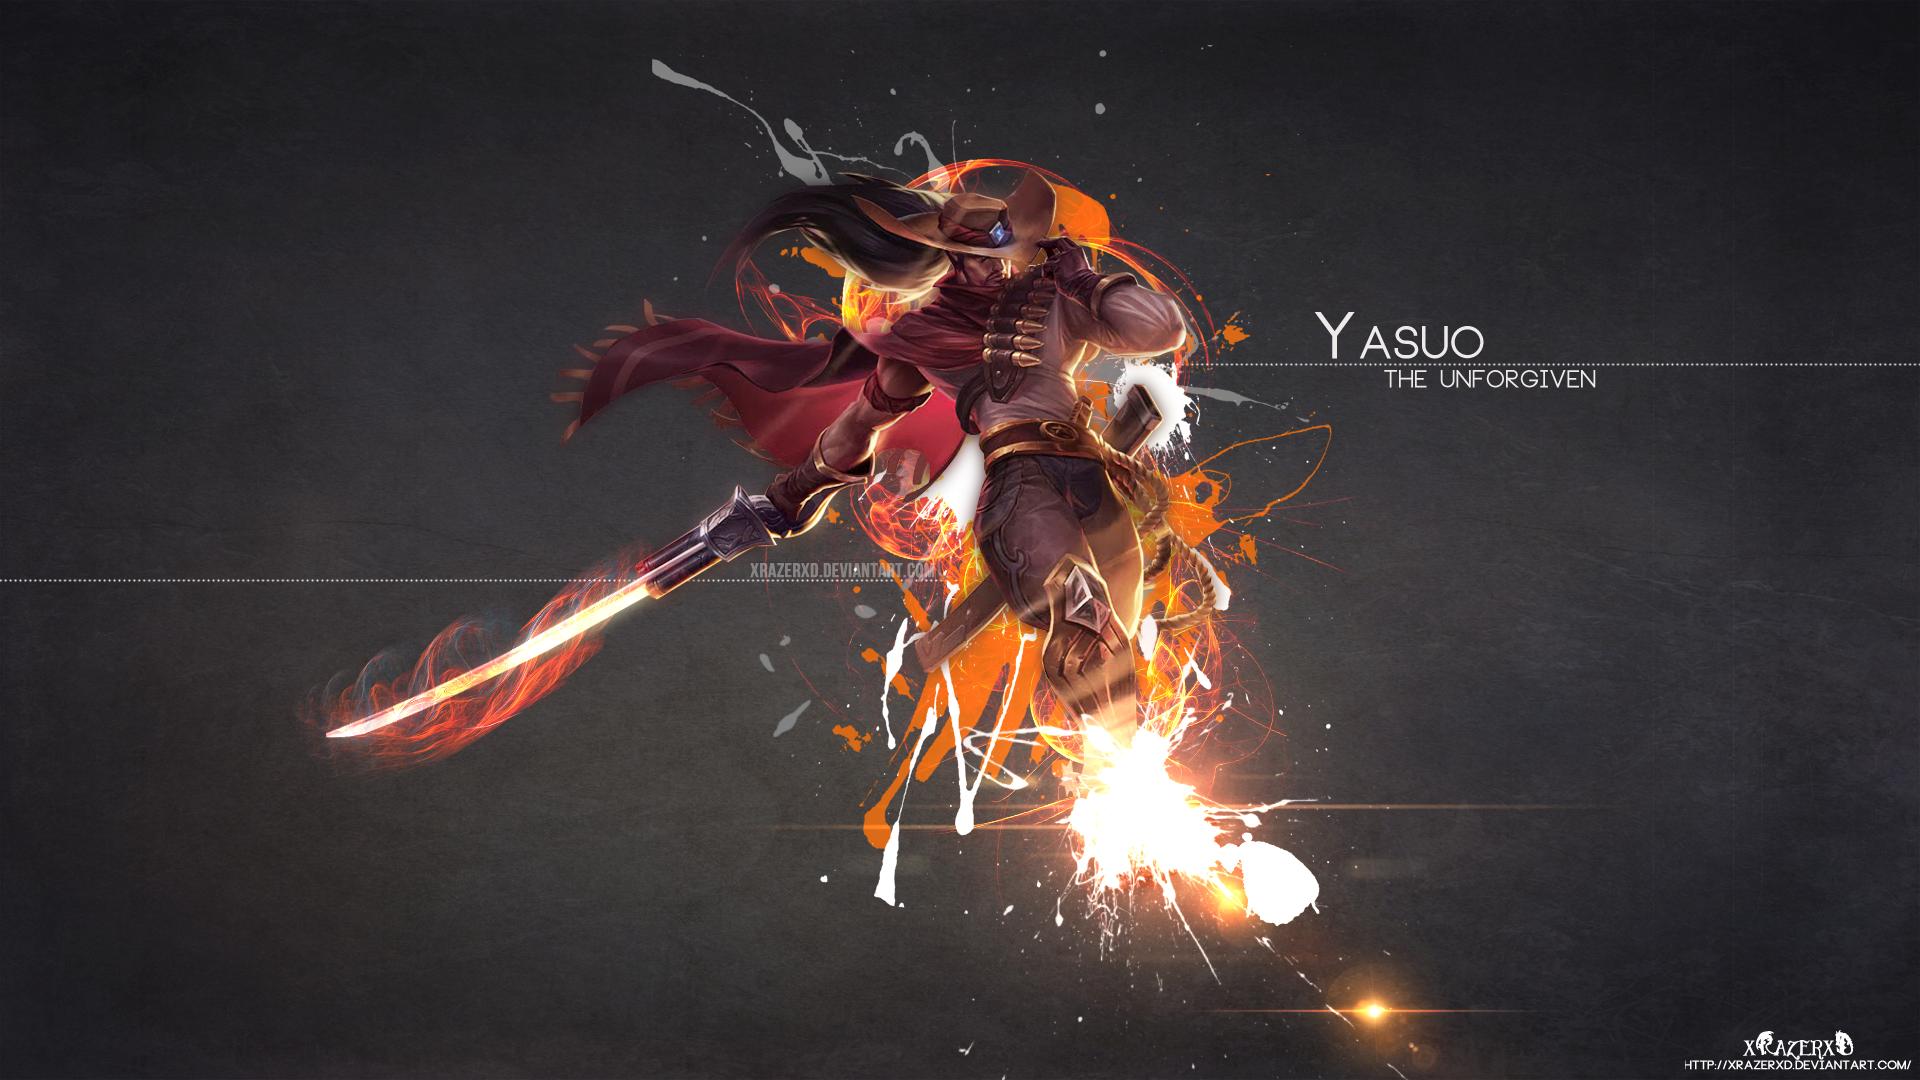 yasuo wallpaper - photo #9